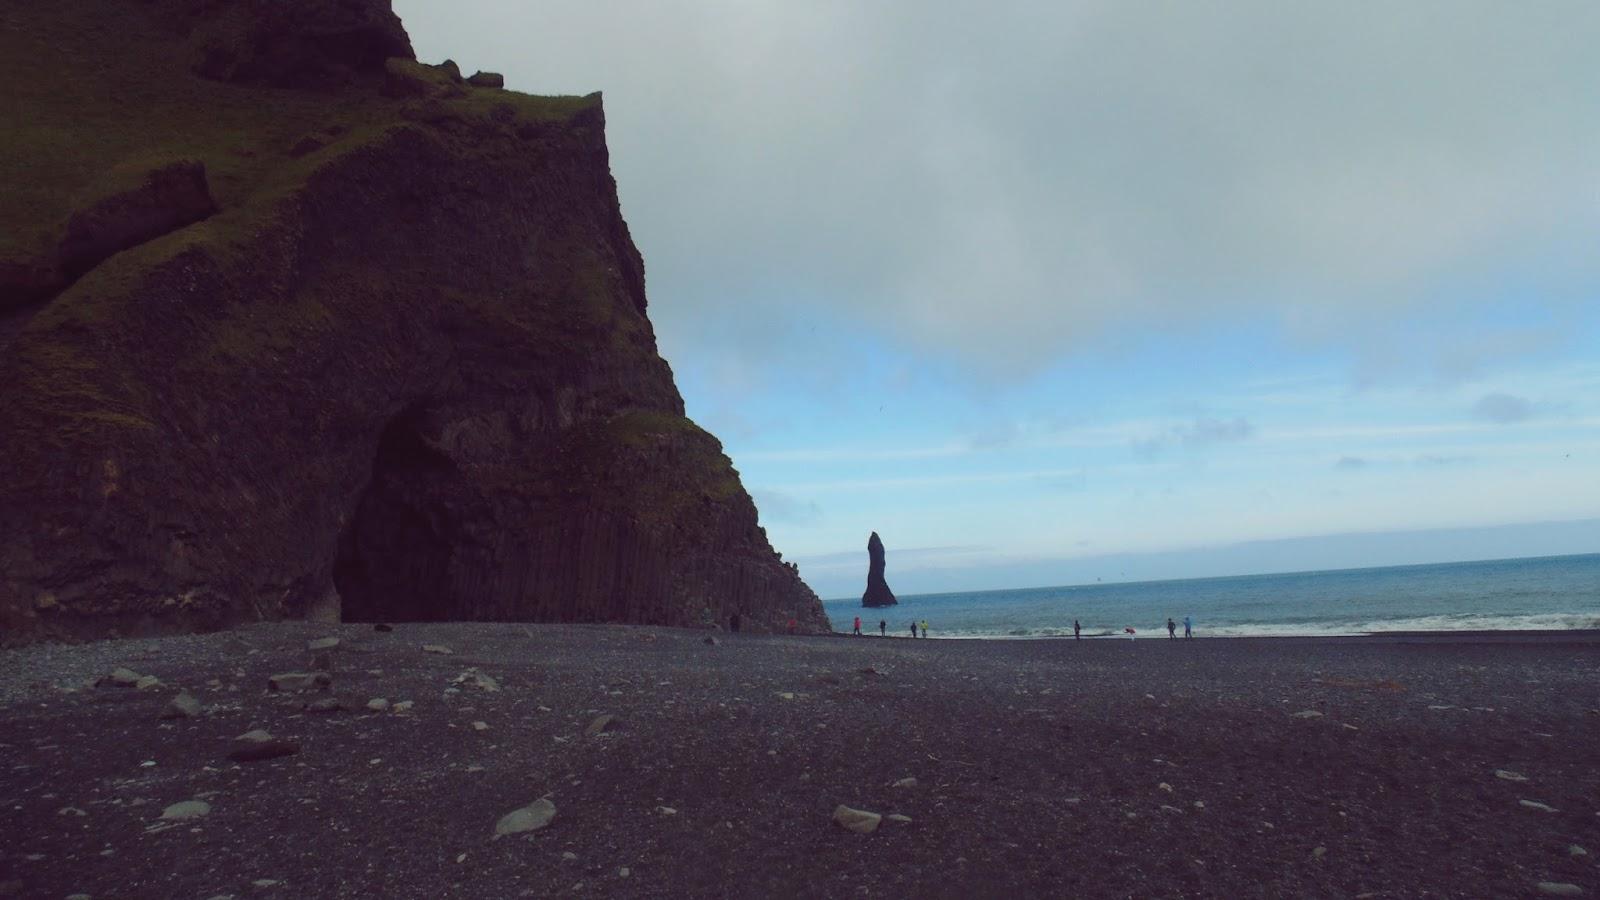 jaskinia Halsanefshellir, Reynisfjara, czarna plaża, Islandia